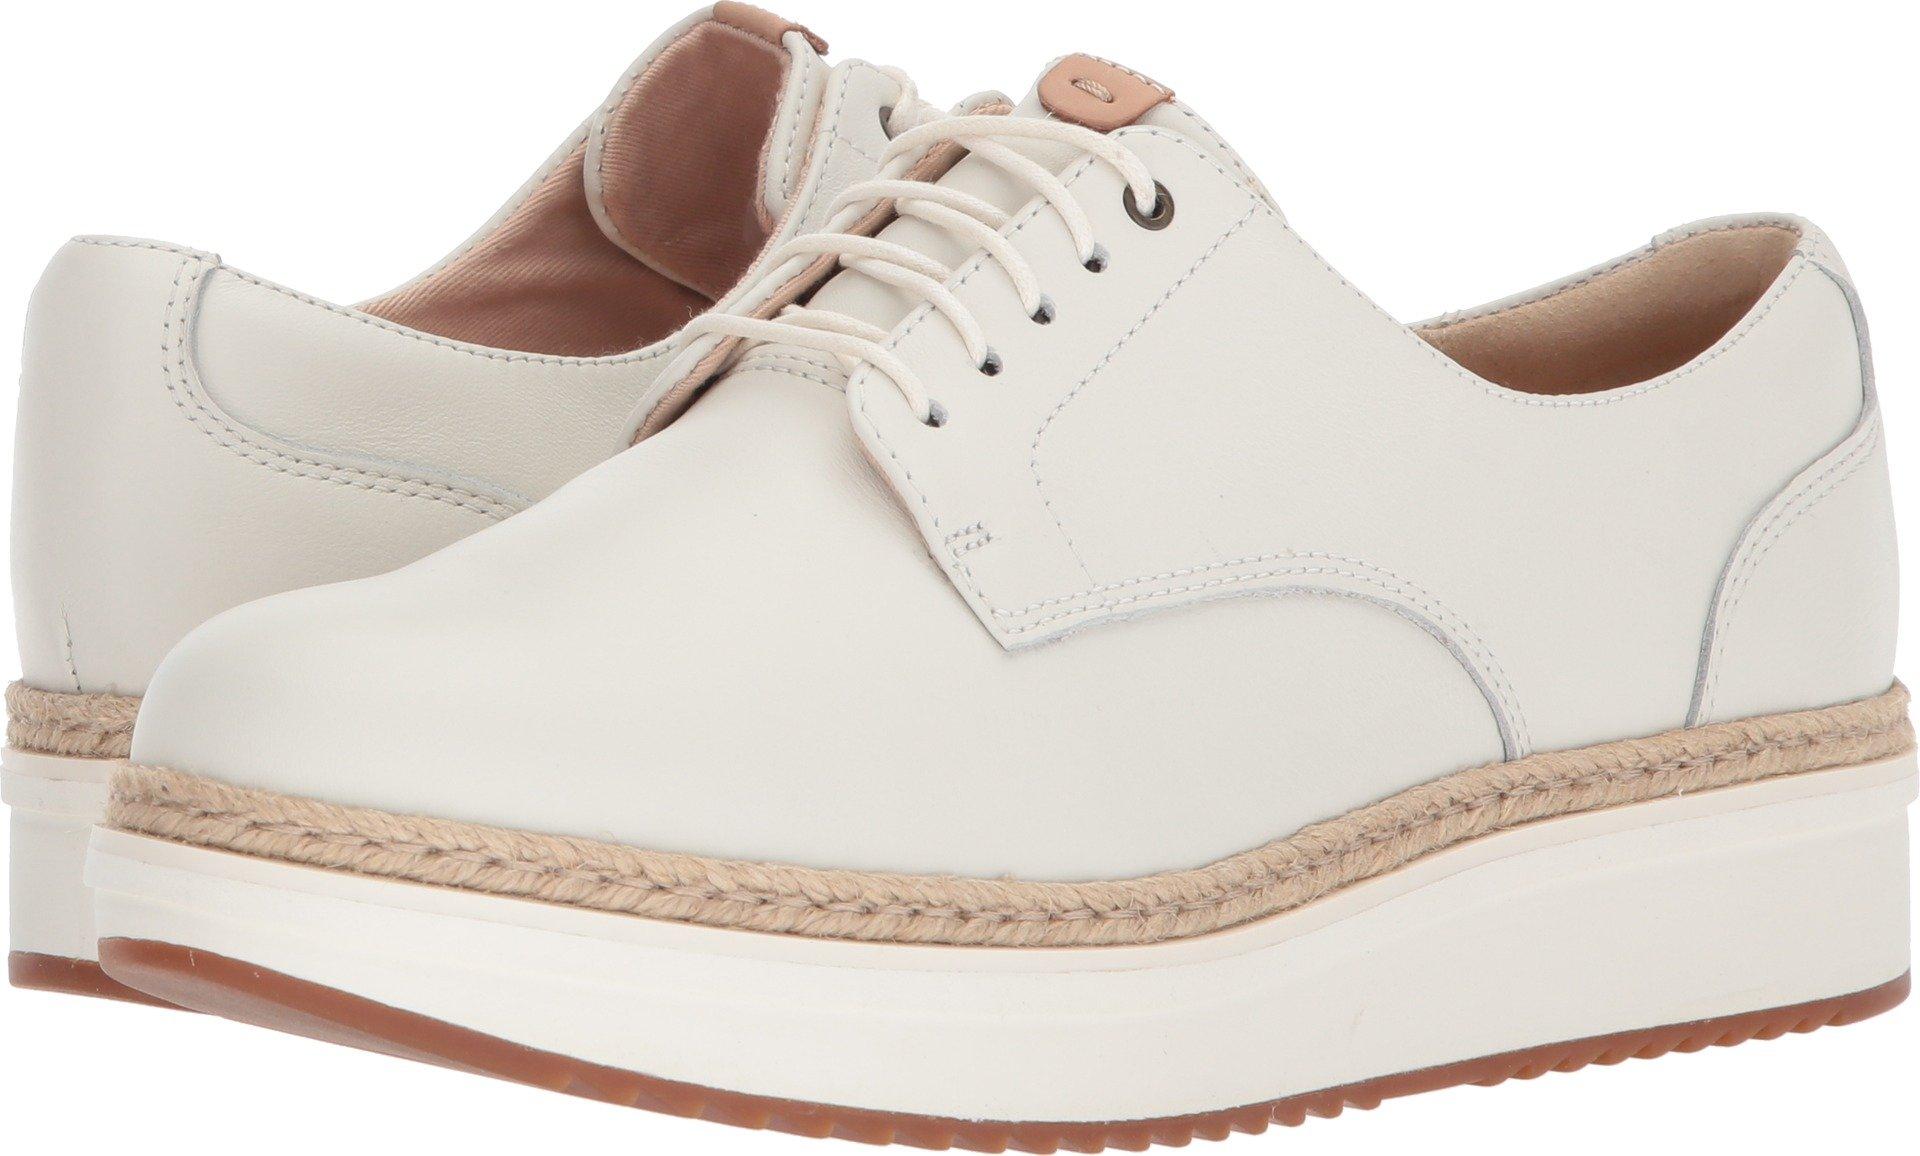 CLARKS Women's Teadale Rhea White Leather 5.5 B US by CLARKS